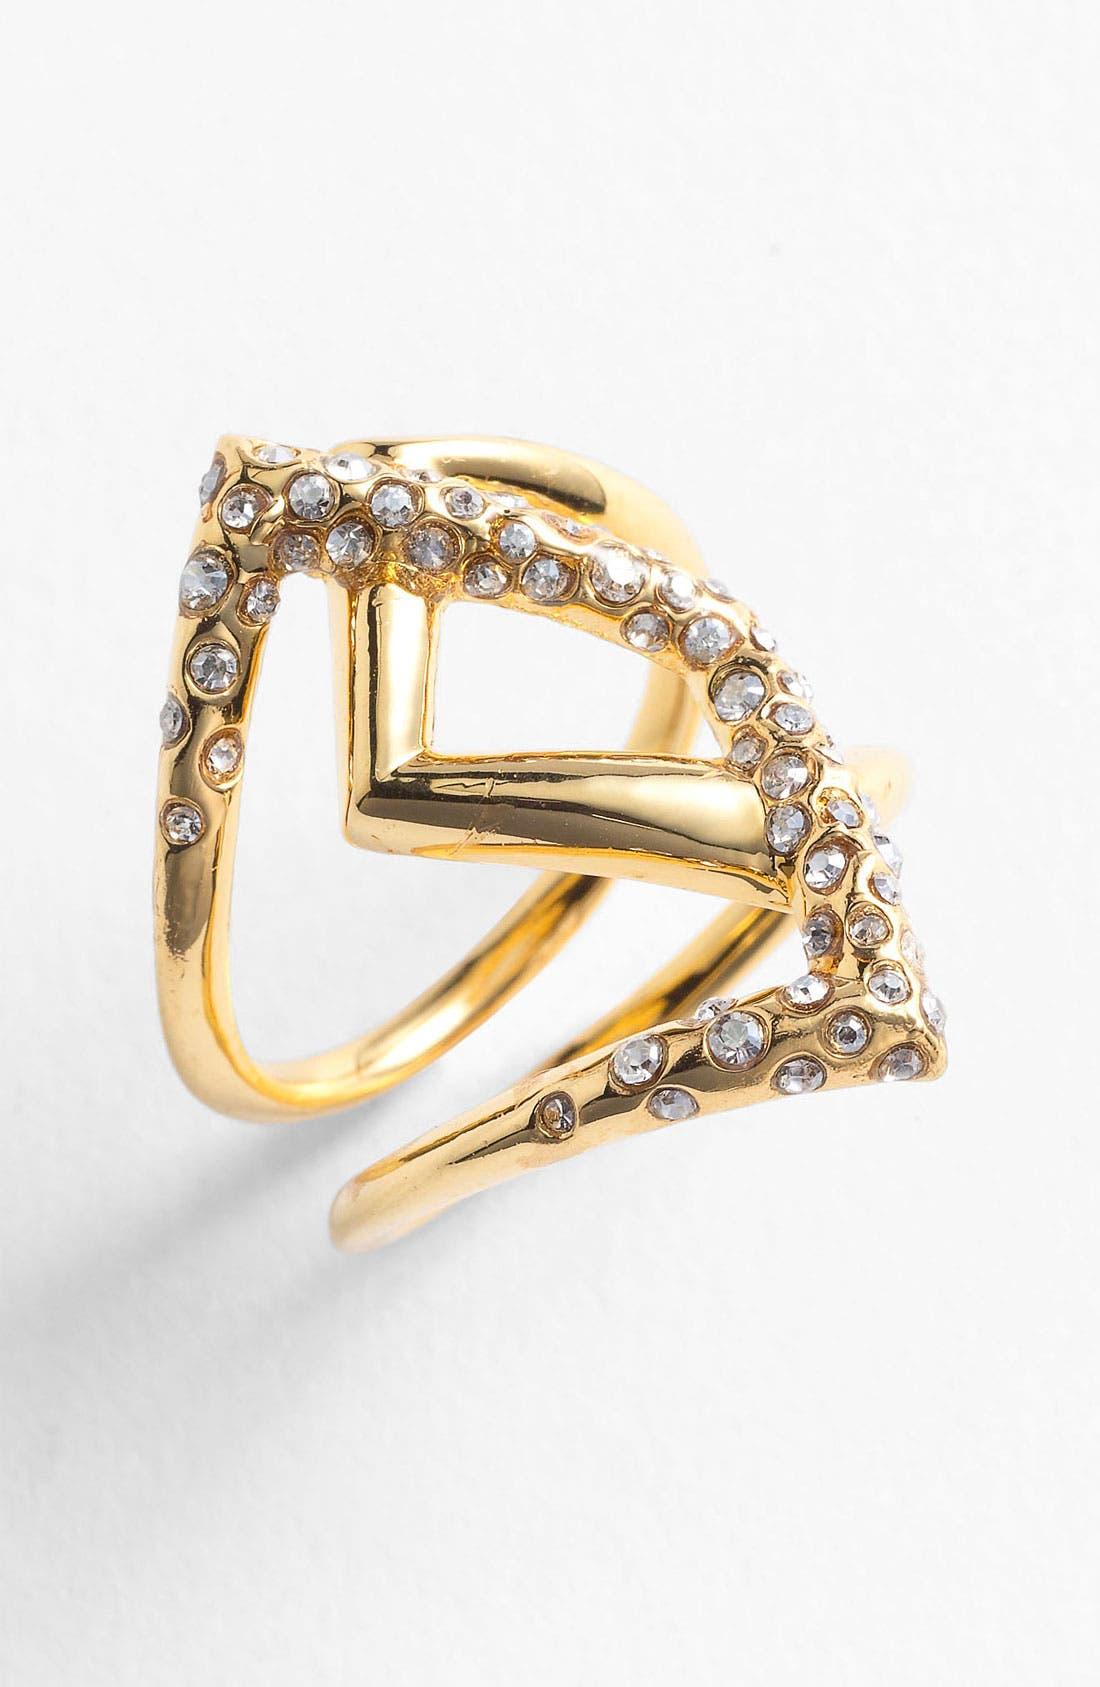 Main Image - Alexis Bittar 'Miss Havisham - New Wave' Overlap Ring